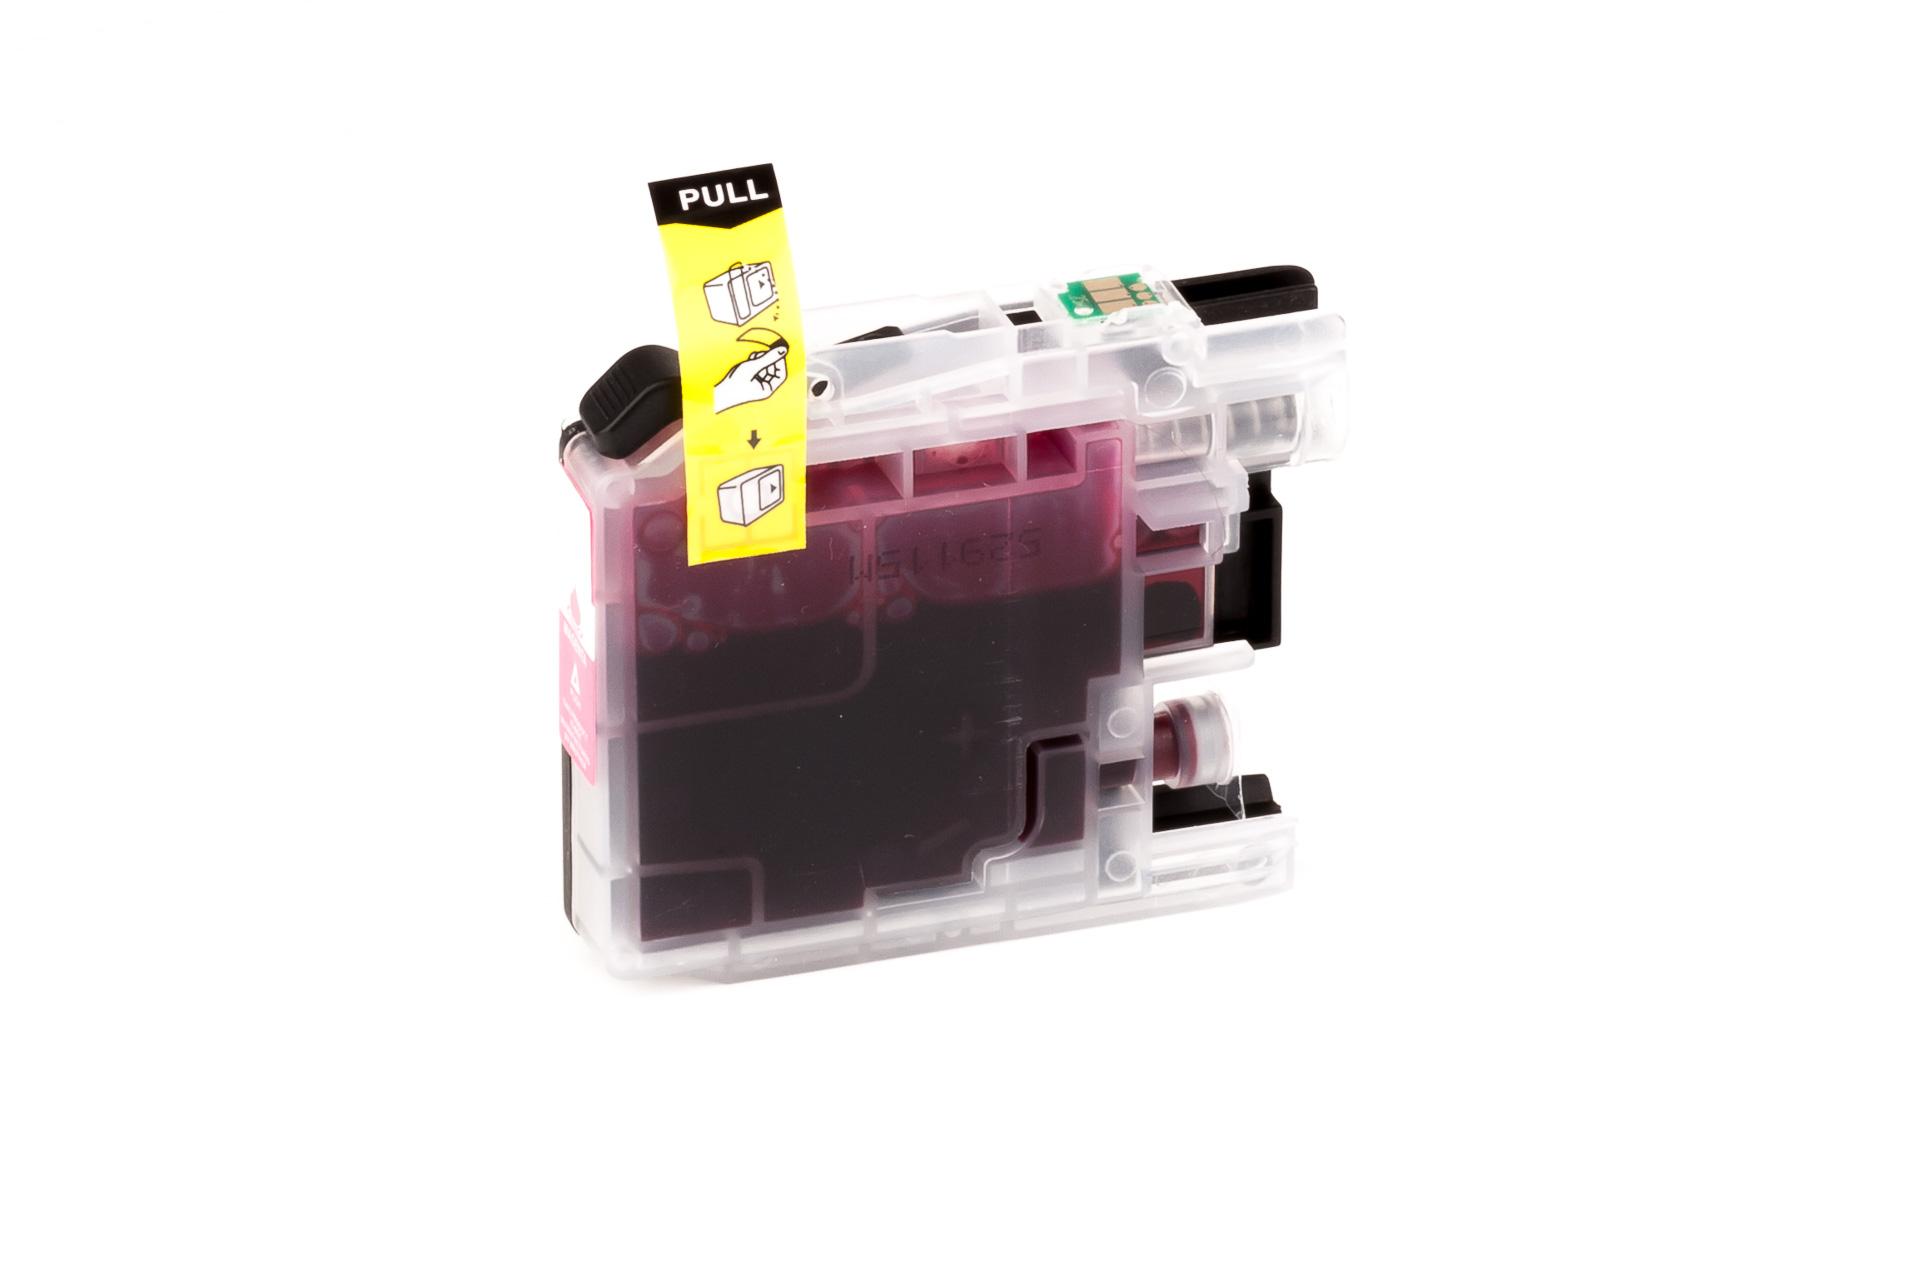 ASC-Premium-Tintenpatrone für Brother MFC-J 4410 DW gelb MFC-J 4410 DW MFC-J4410DW